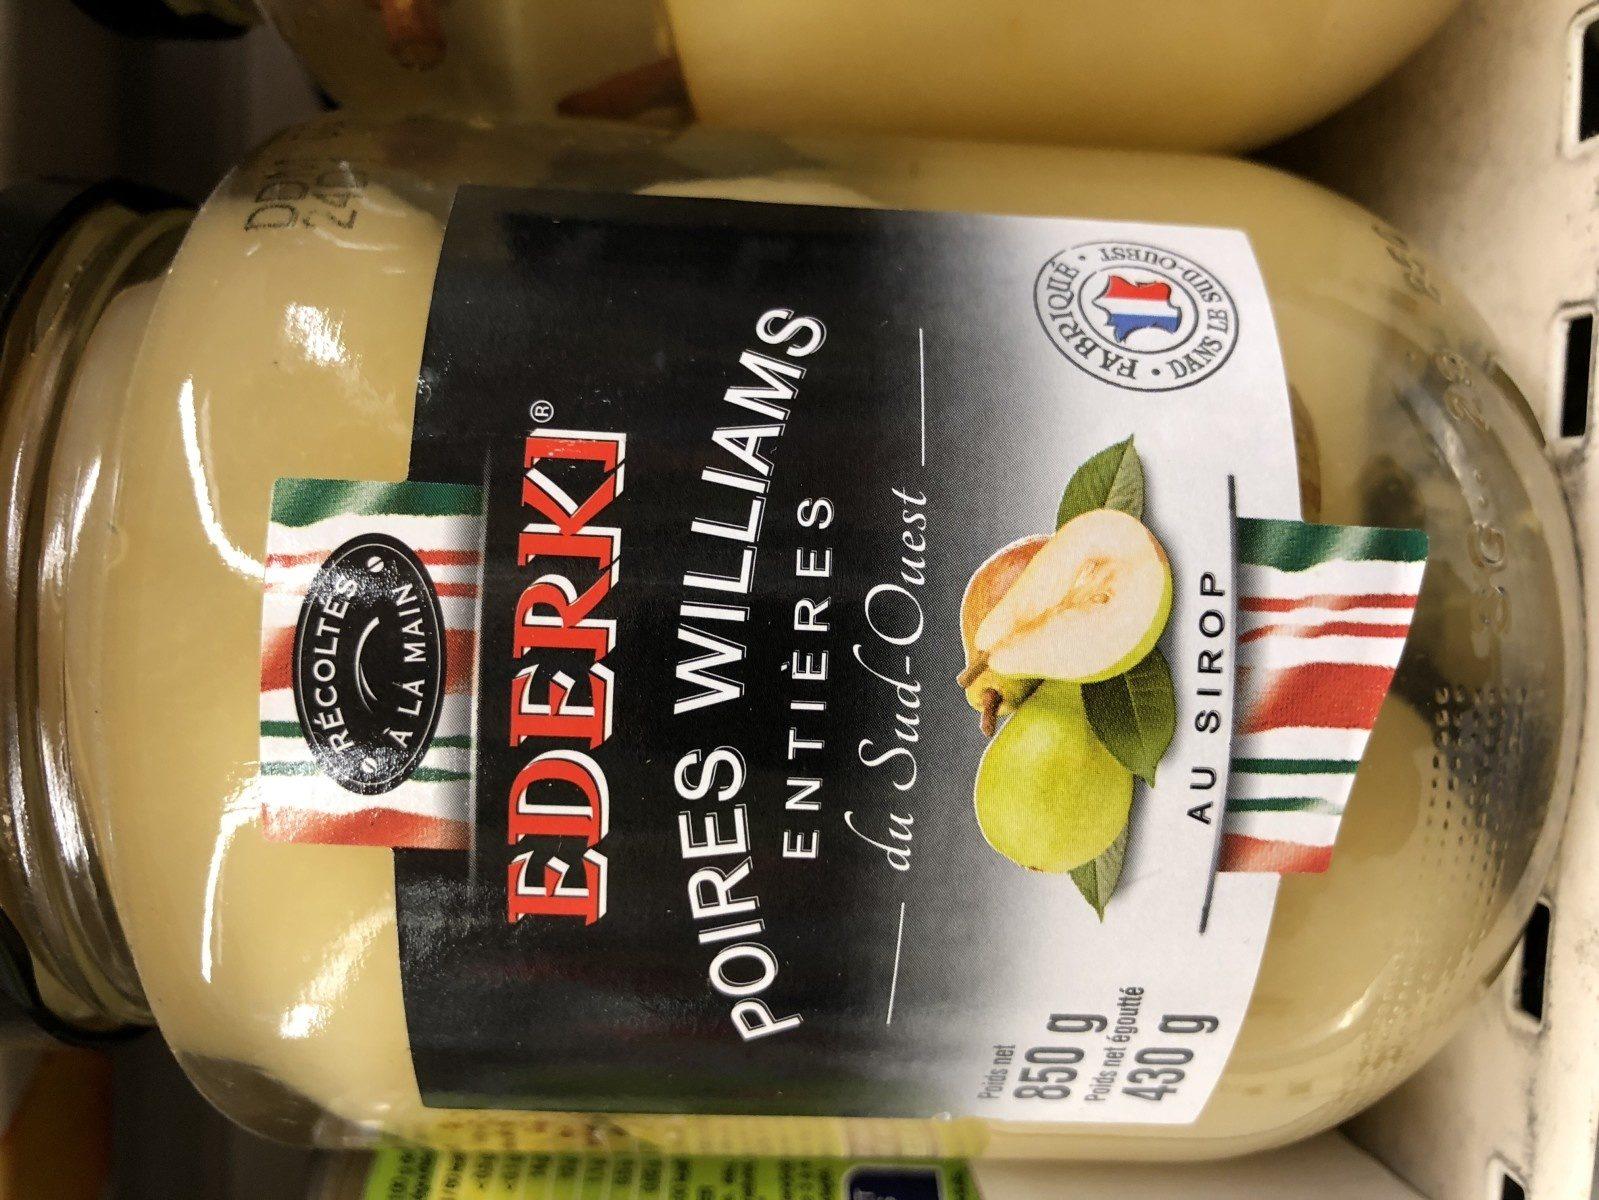 Poires Williams entières au sirop EDERKI - Ingredients - fr